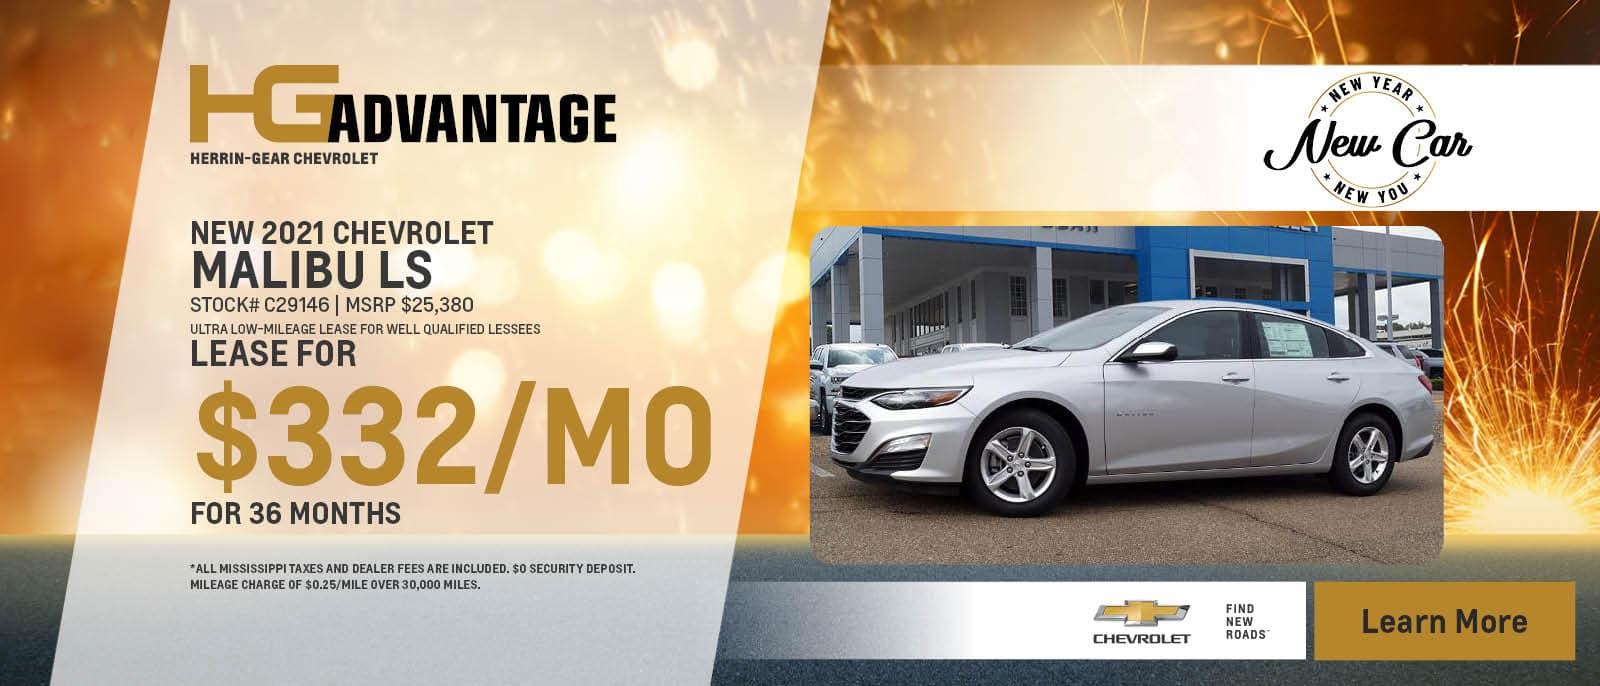 Herrin Gear Chevrolet_11355_00010437_UX_HPB_Malibu